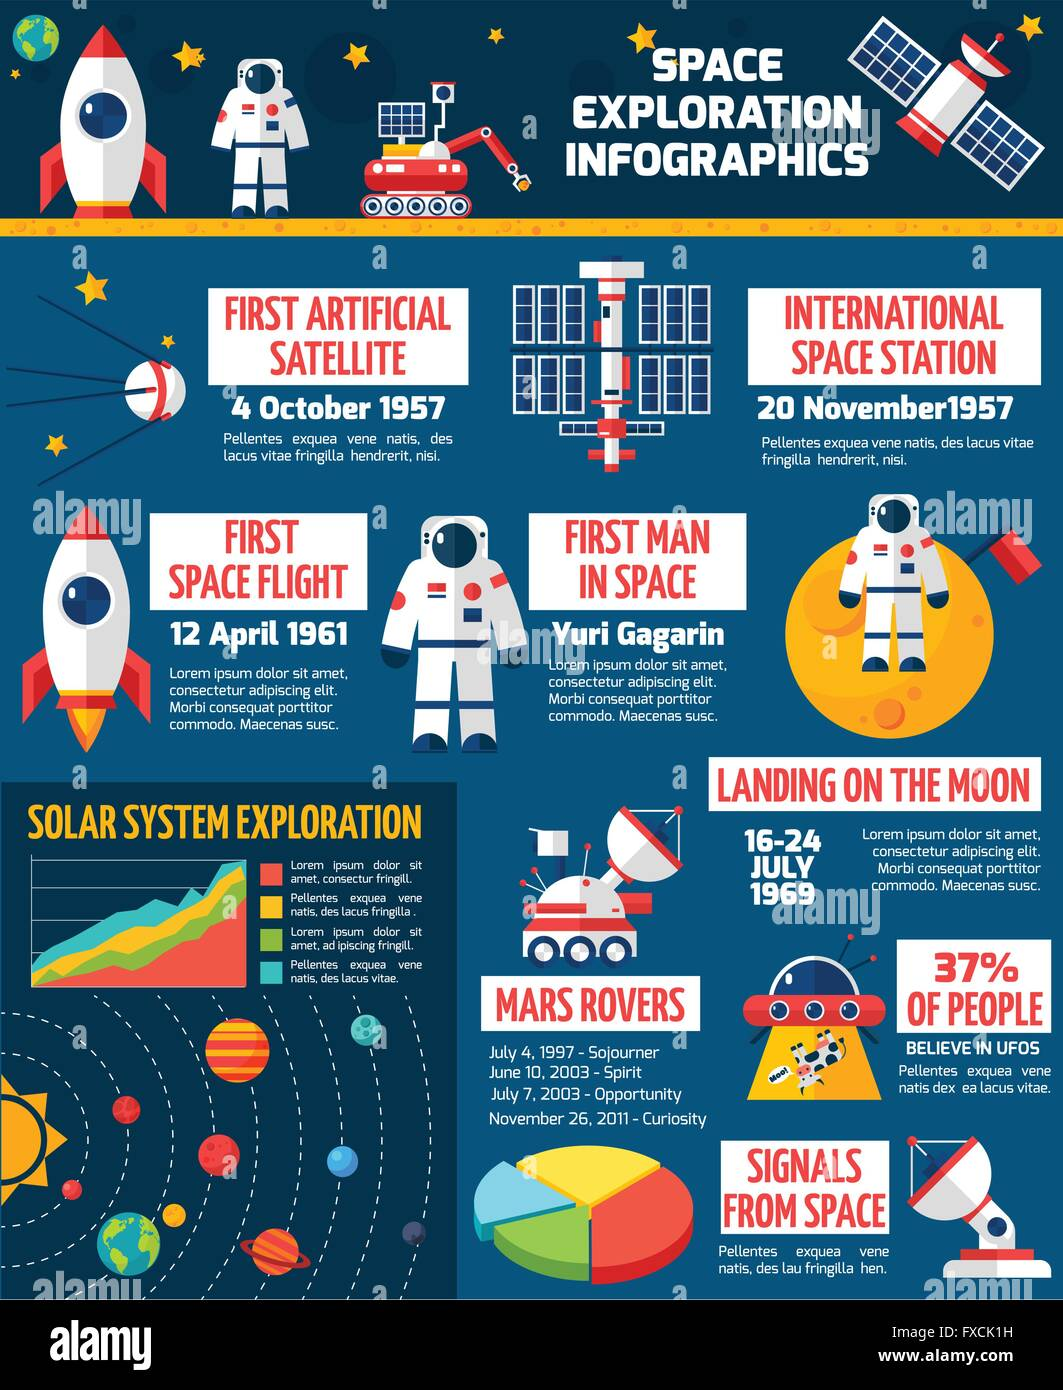 Space exploration merit badge slide show.